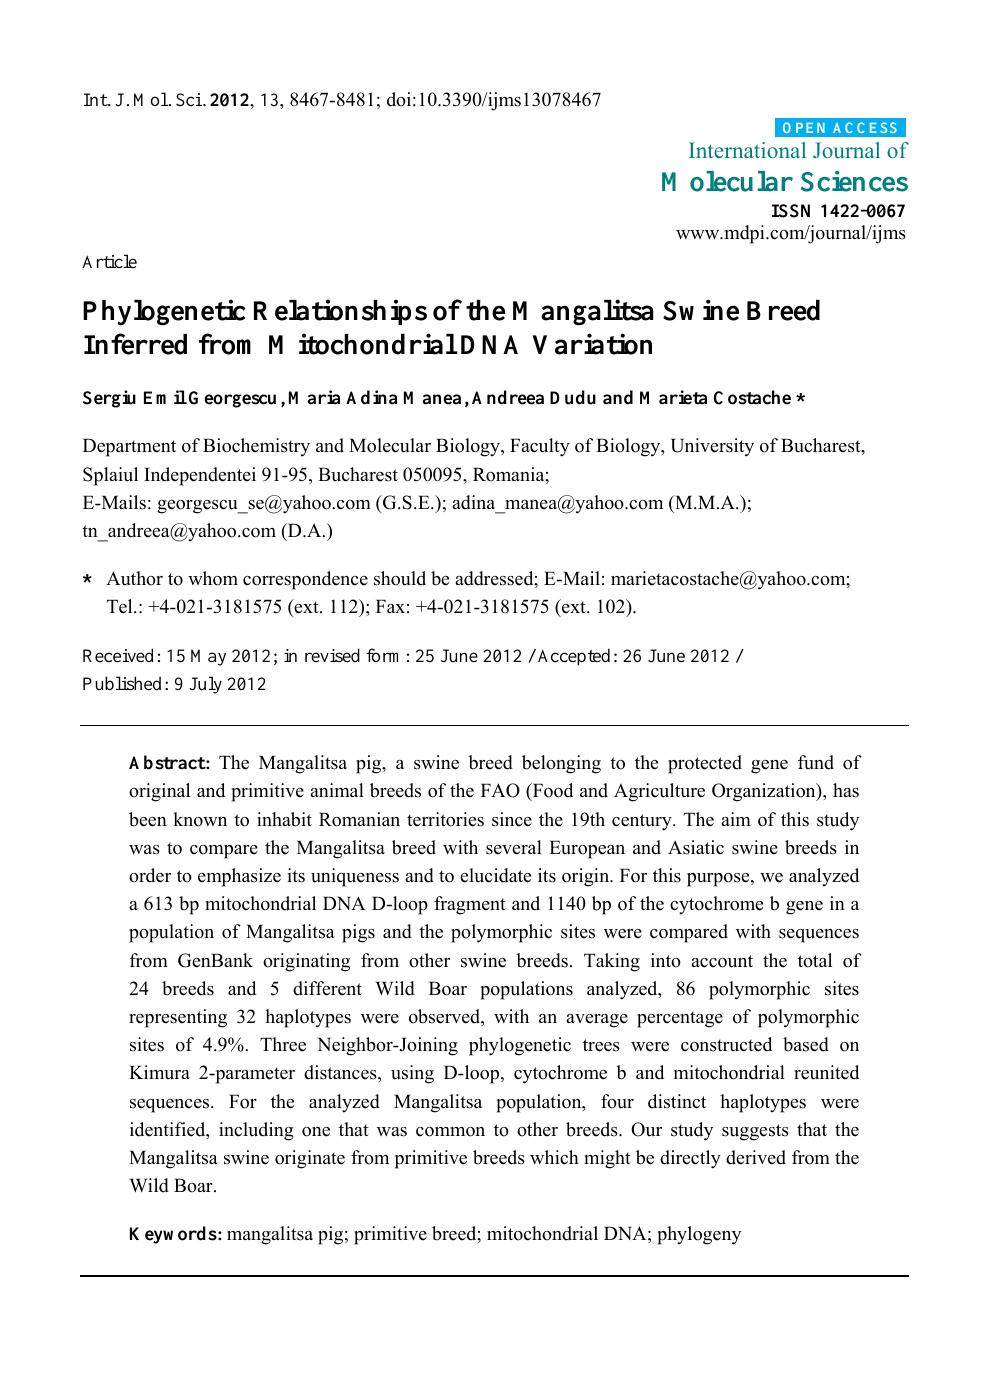 Andreea Reyes phylogenetic relationships of the mangalitsa swine breed